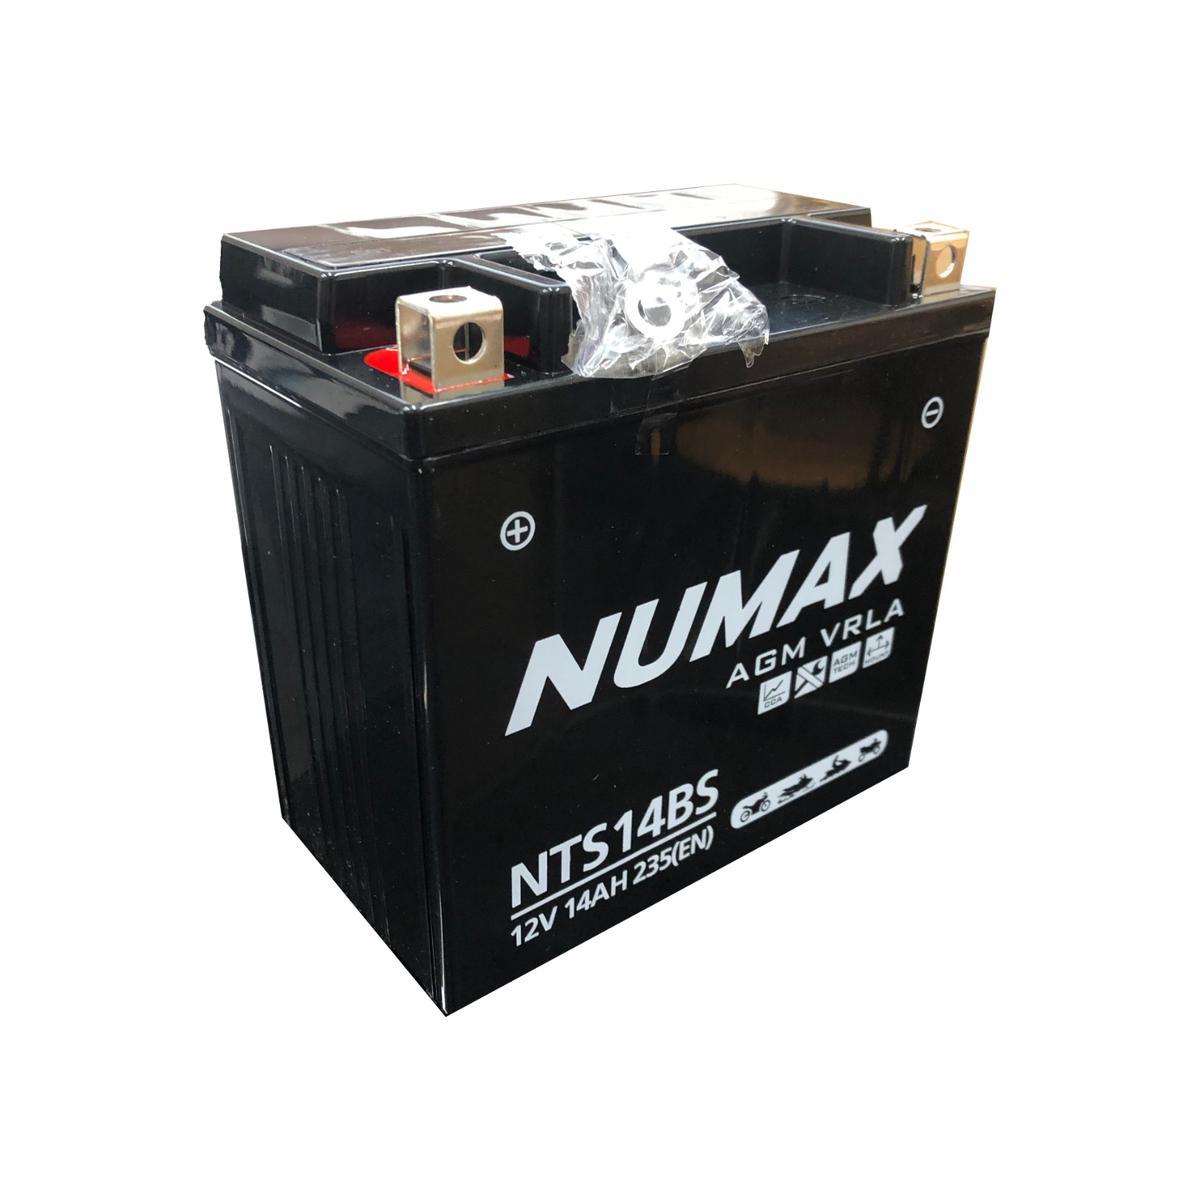 Numax NTS14BS 12v Motorbike Bike Battery TRIUMPH 885cc Tiger YTX14-4